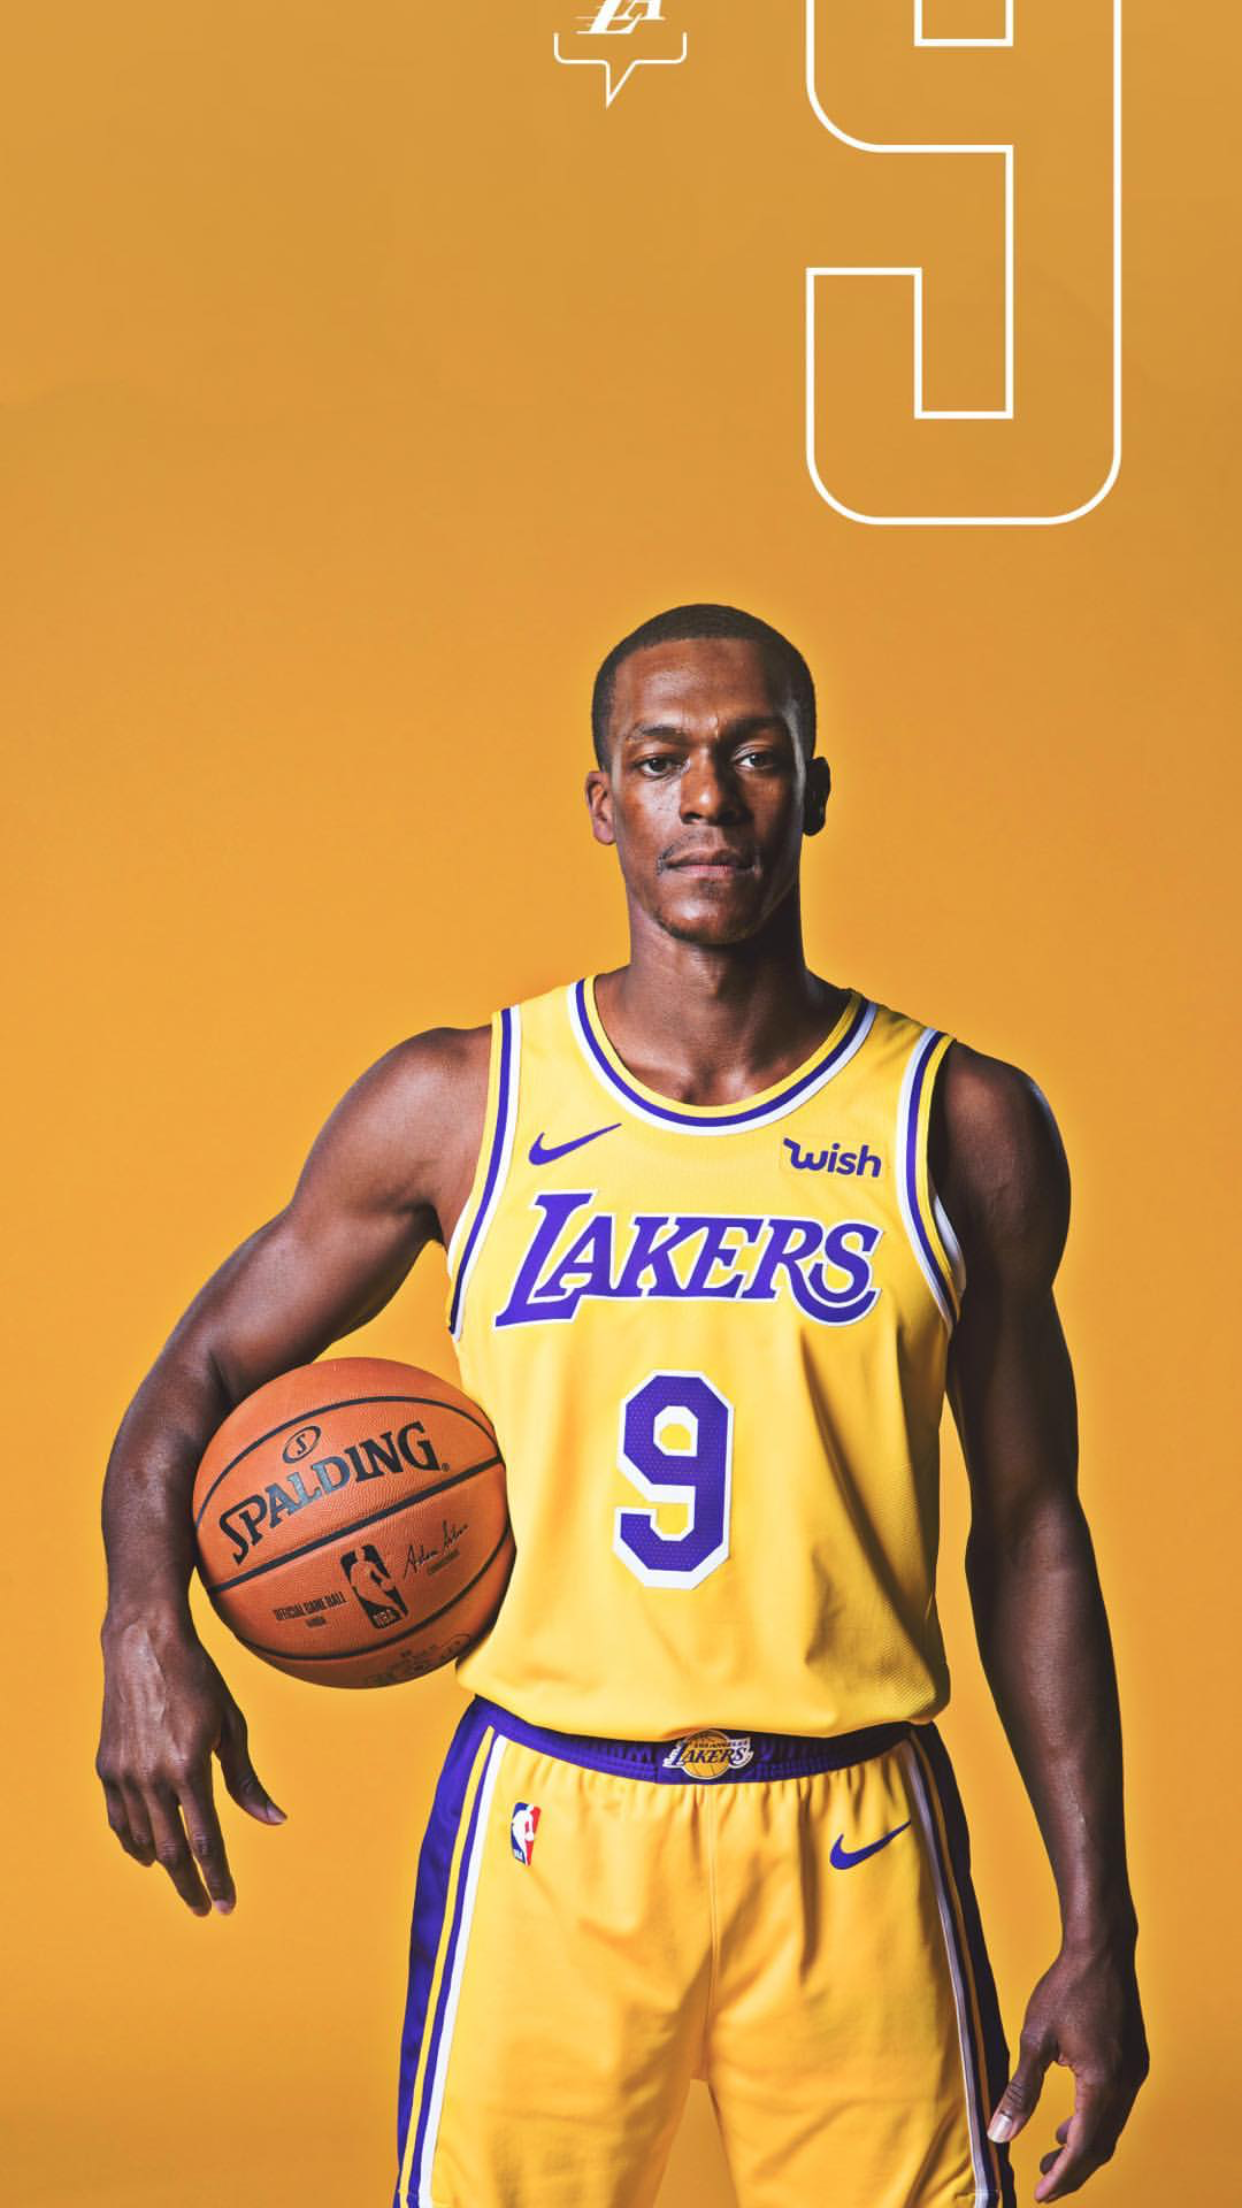 promo code 4dd2e 4923b Rajon Rondo Lakers | Lakers | Nba lebron james, Nba players ...